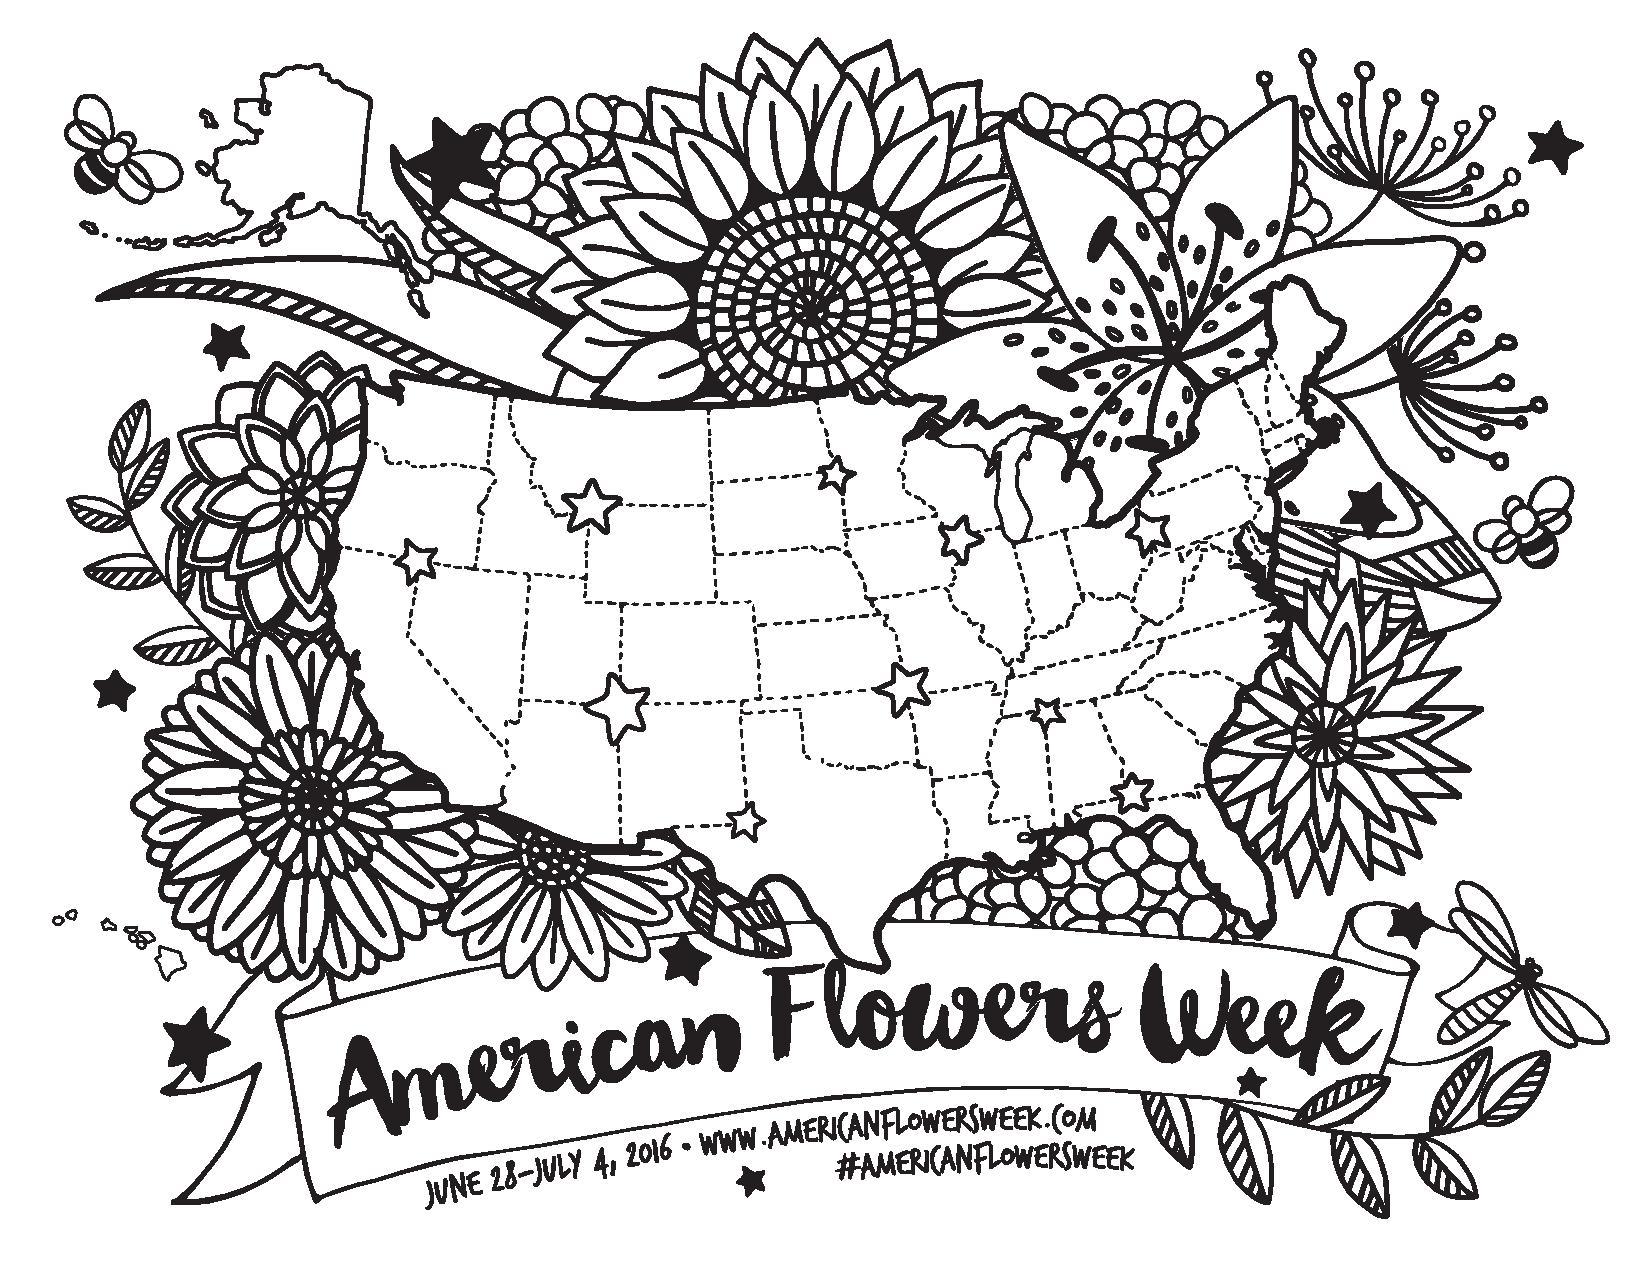 USA Floral Coloring Map   american flowers week